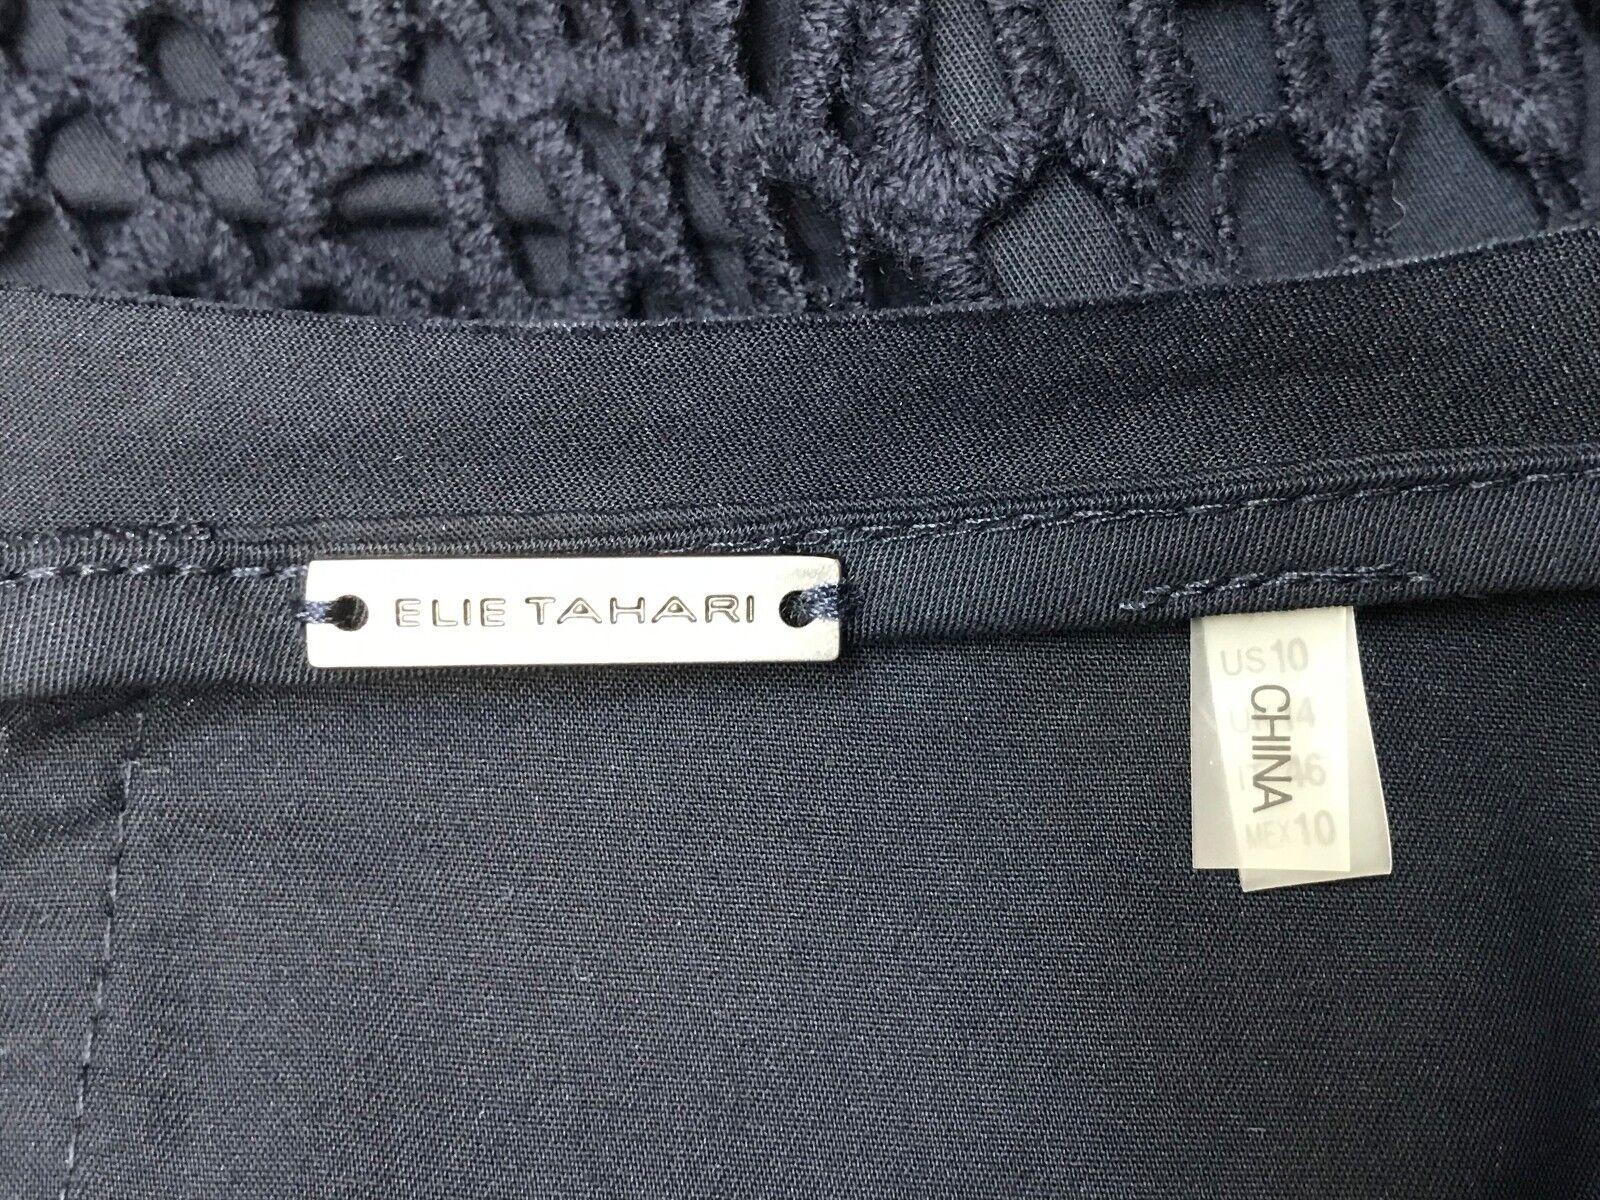 ELIE TAHARI DRESS DRESS DRESS NAVY COTTON AMAZING 2 LAYERS OF BROCADE LACE SIZE IT 46 US 10 fa275c